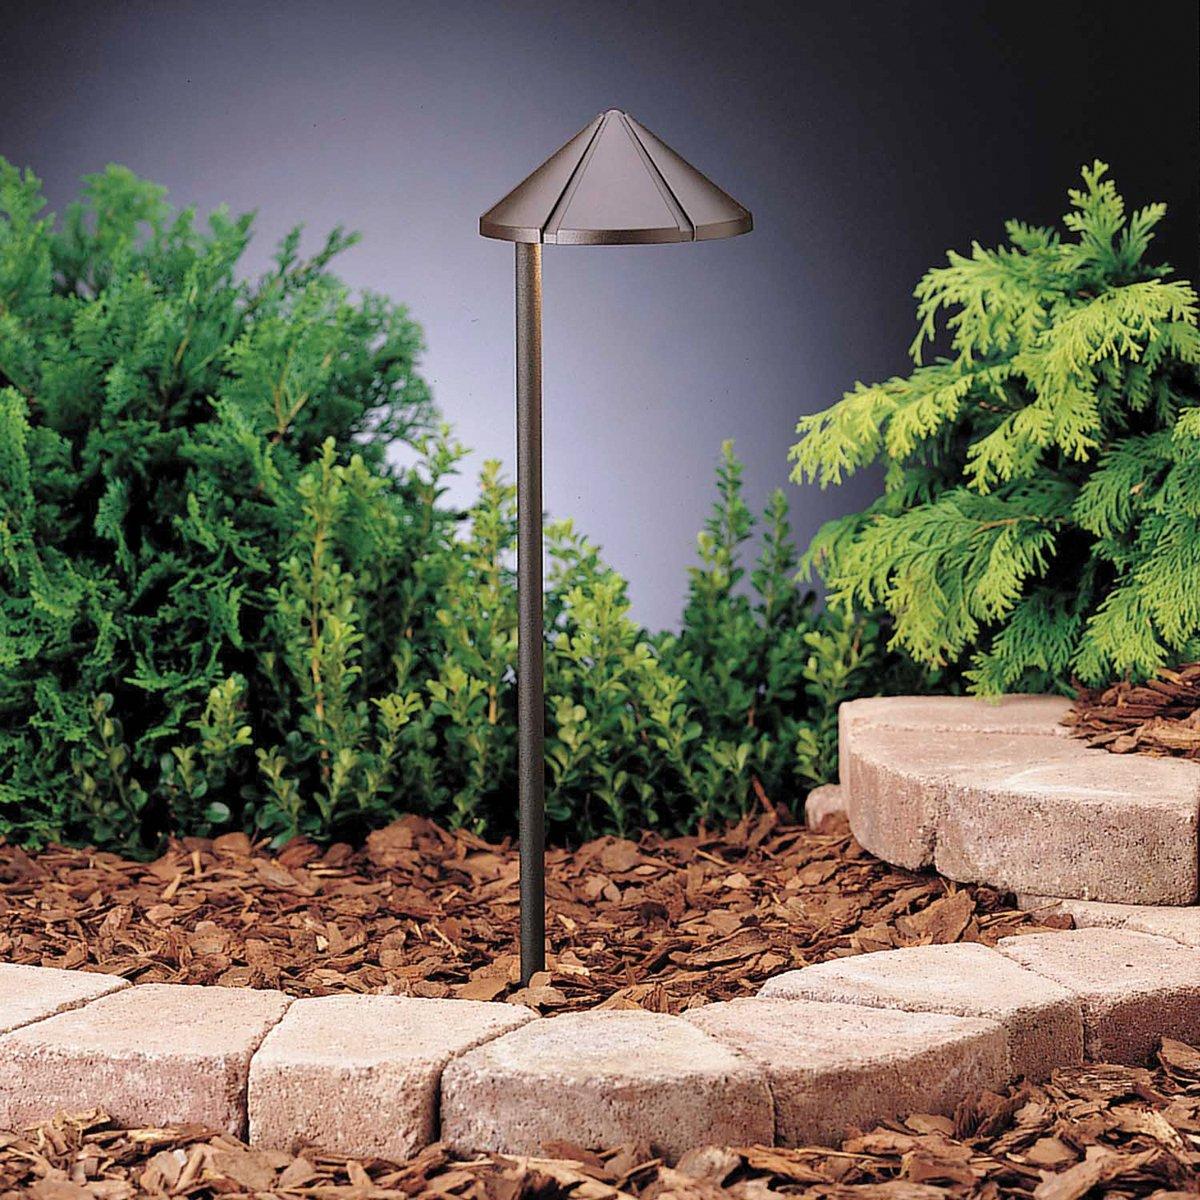 Kichler 15315azt one light path spread landscape path lights kichler 15315azt one light path spread landscape path lights amazon mozeypictures Gallery